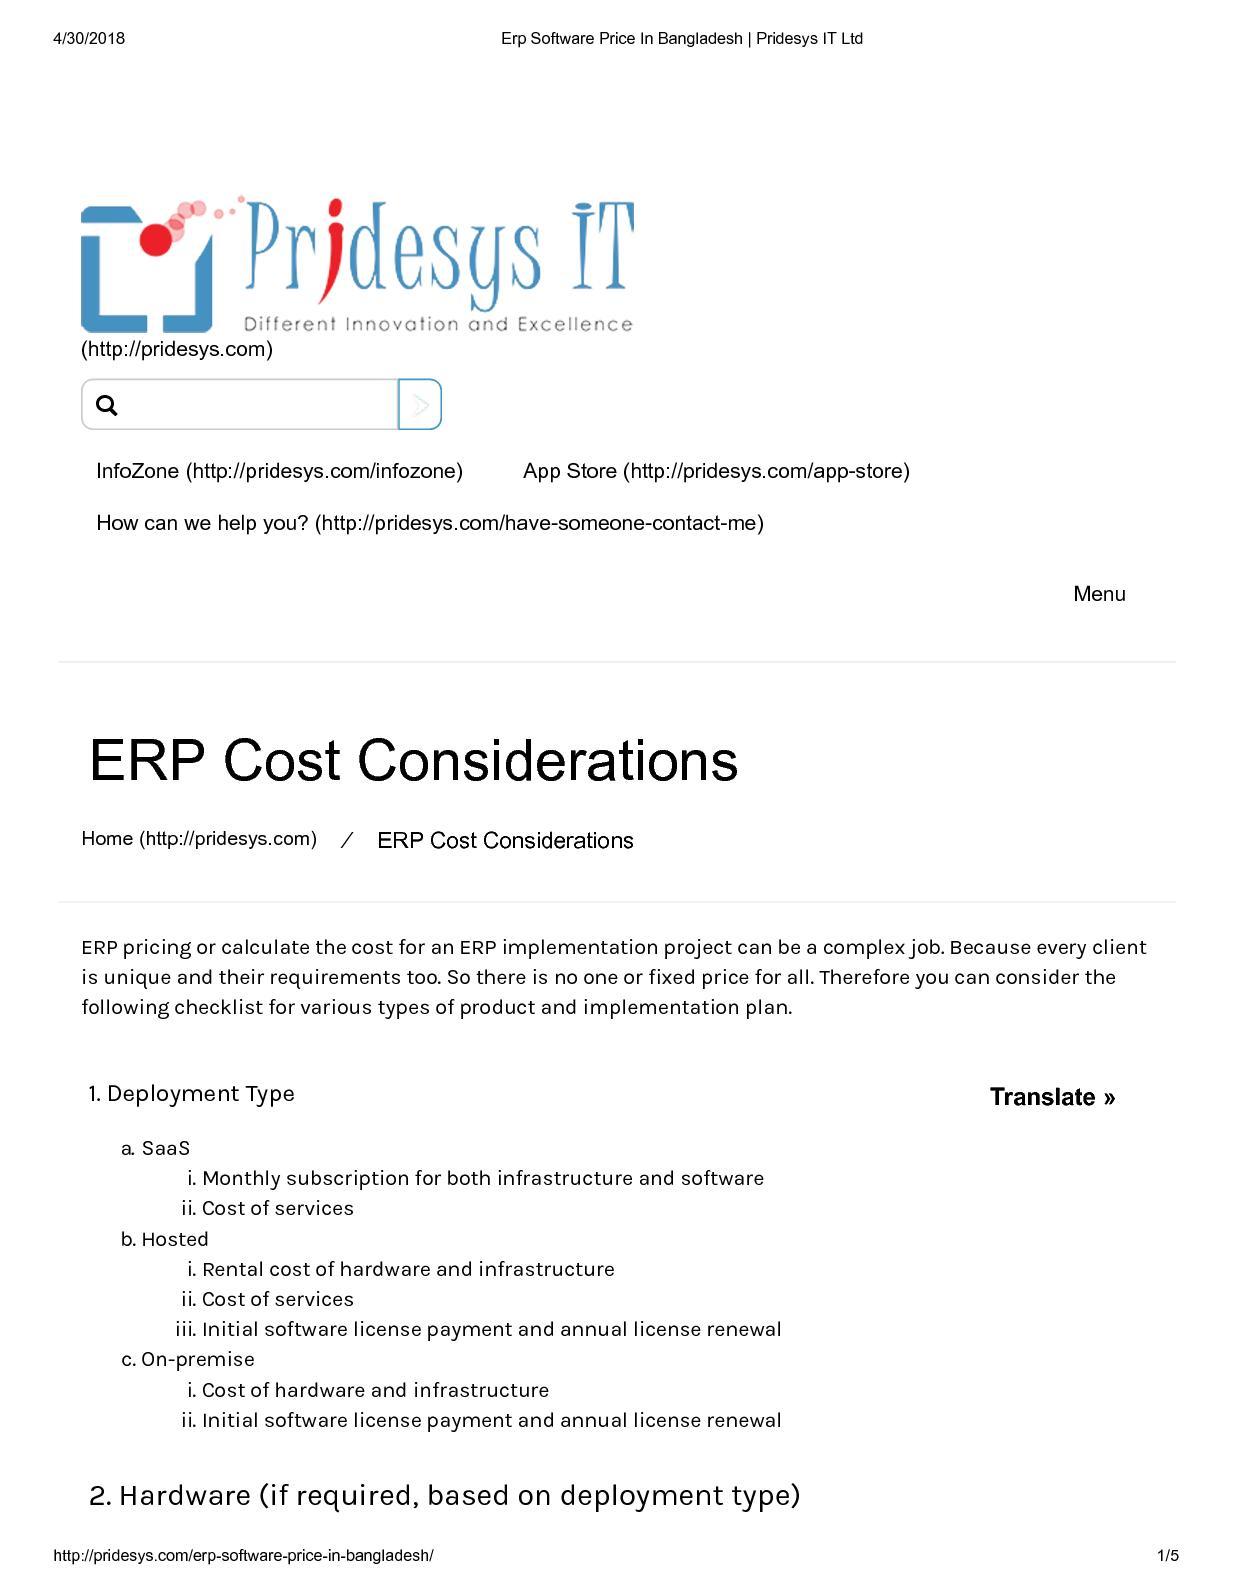 Calaméo - Erp Software Price In Bangladesh Pridesys It Ltd